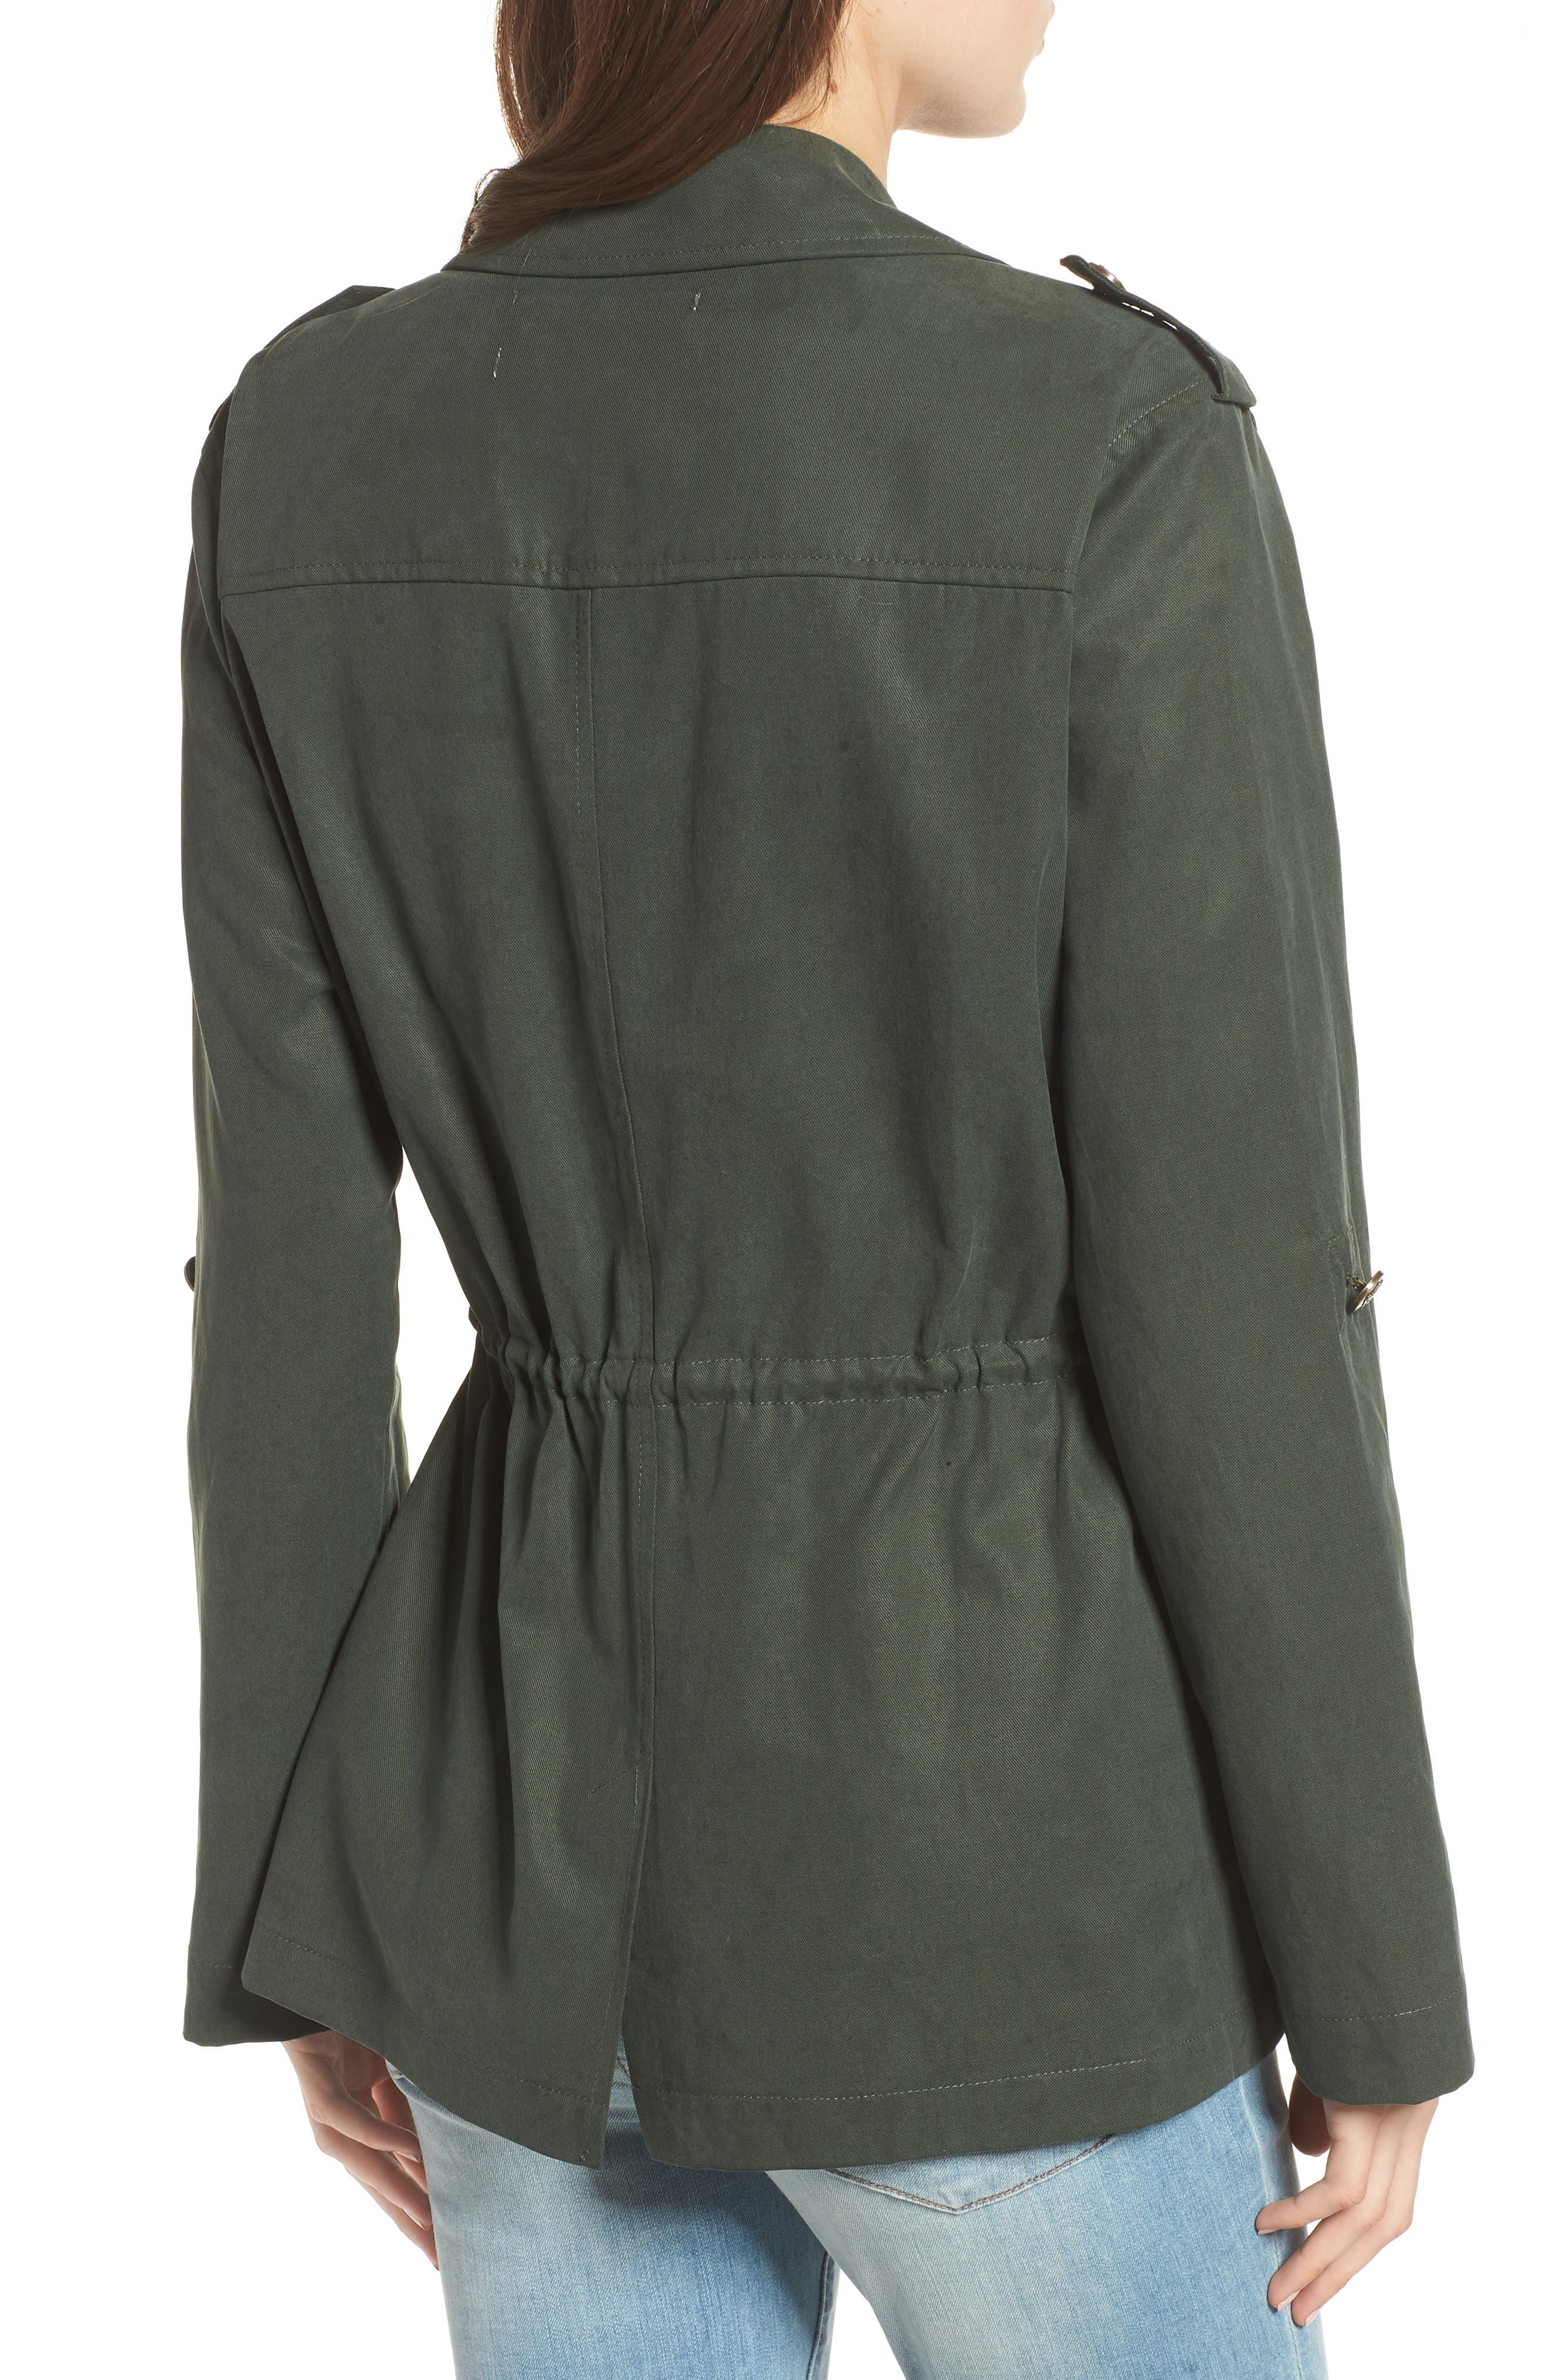 Brannen Military Jacket,                             Alternate thumbnail 2, color,                             310